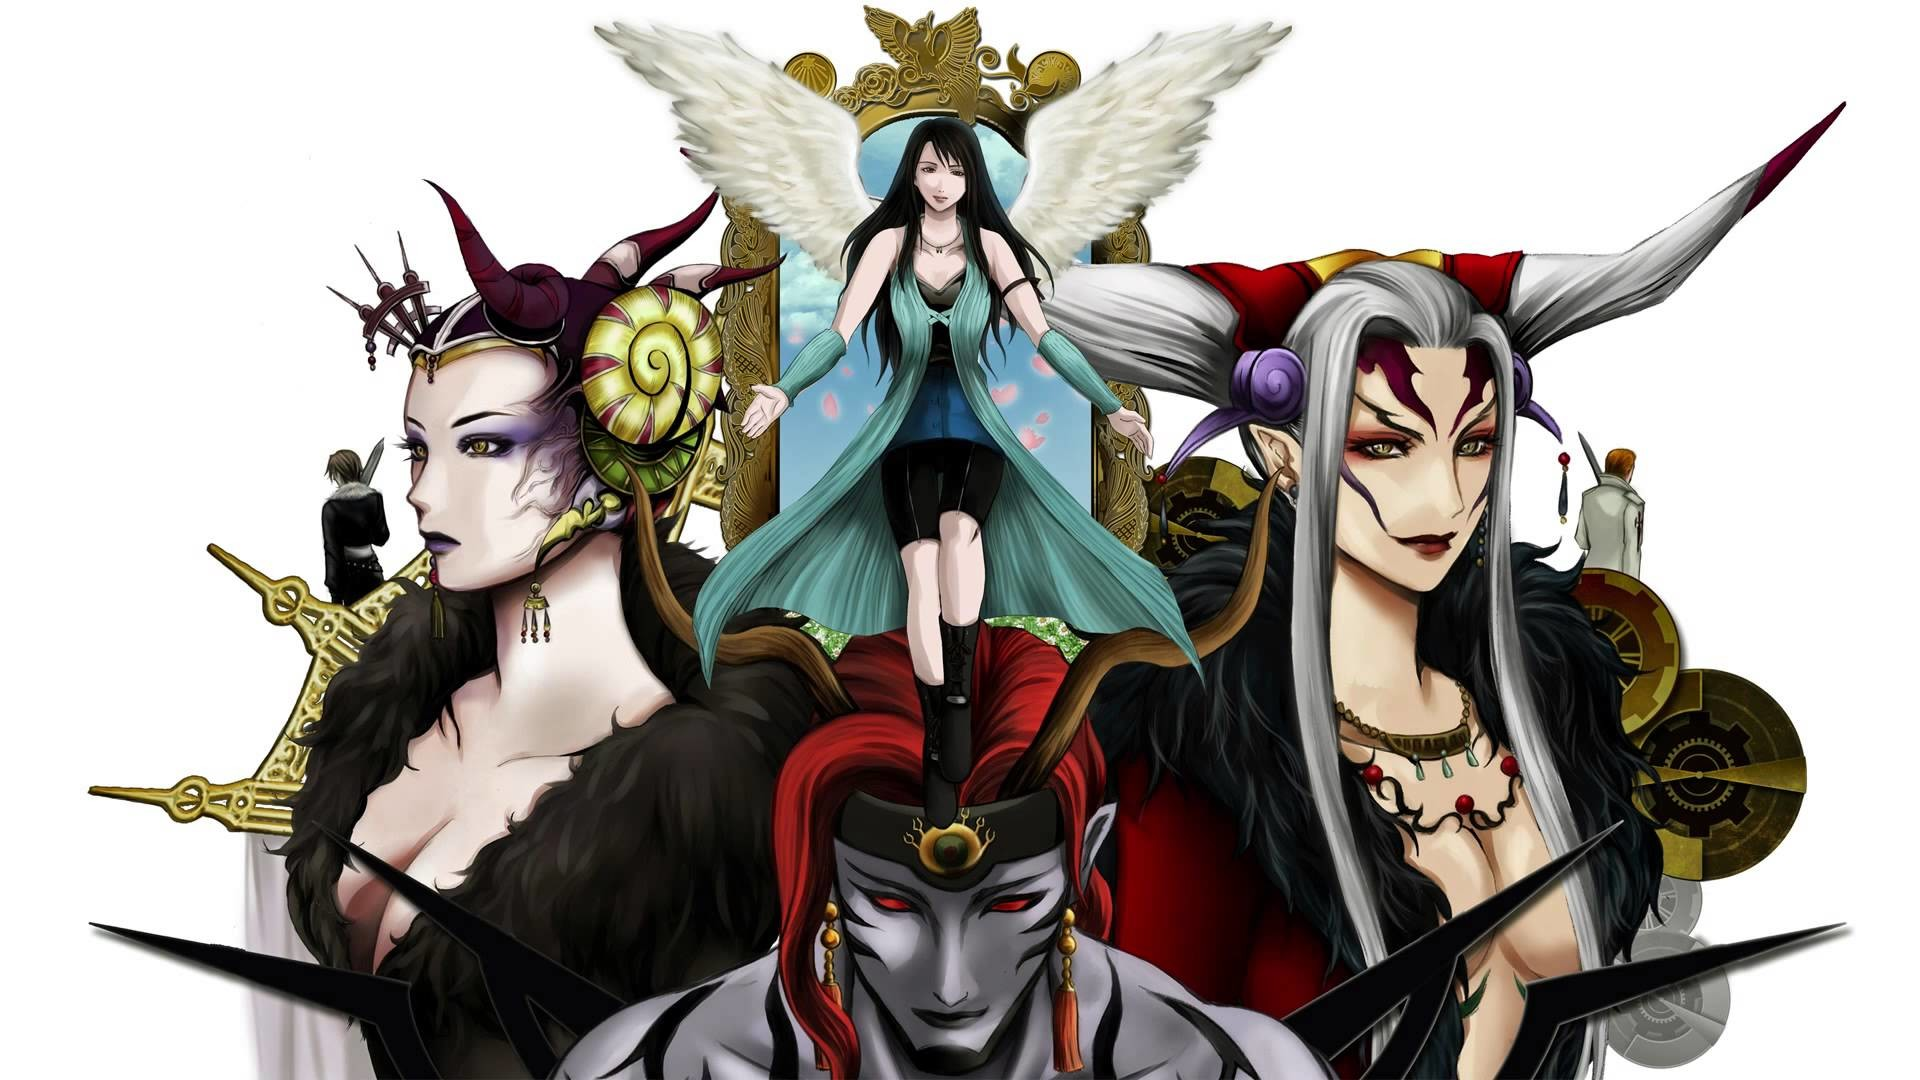 Final Fantasy VIII – Premonition Remastered